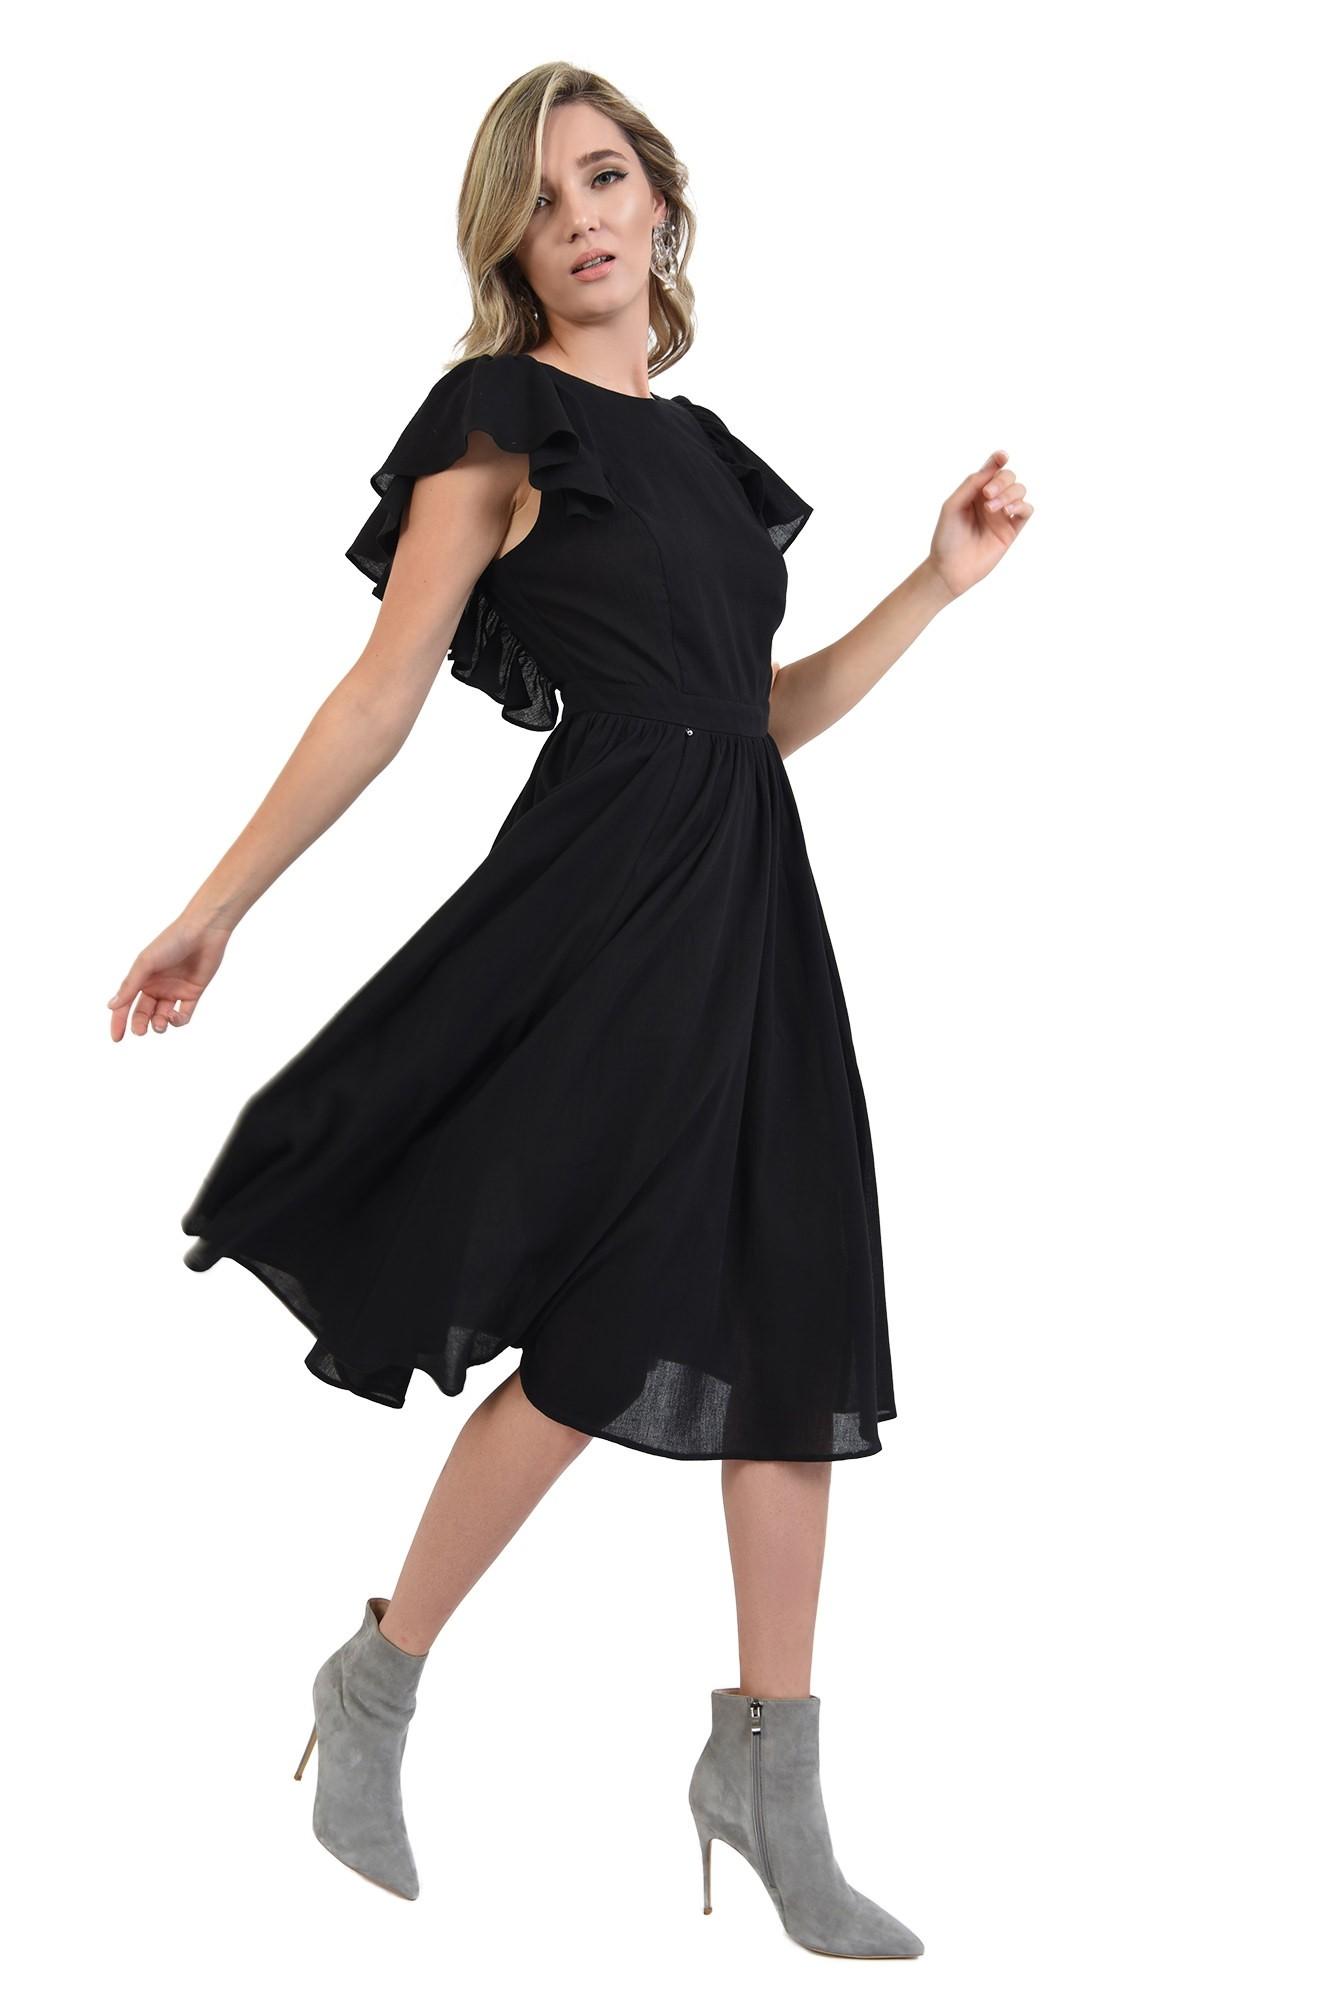 360 - rochie neagra, cu spate gol, evazata, midi, Poema